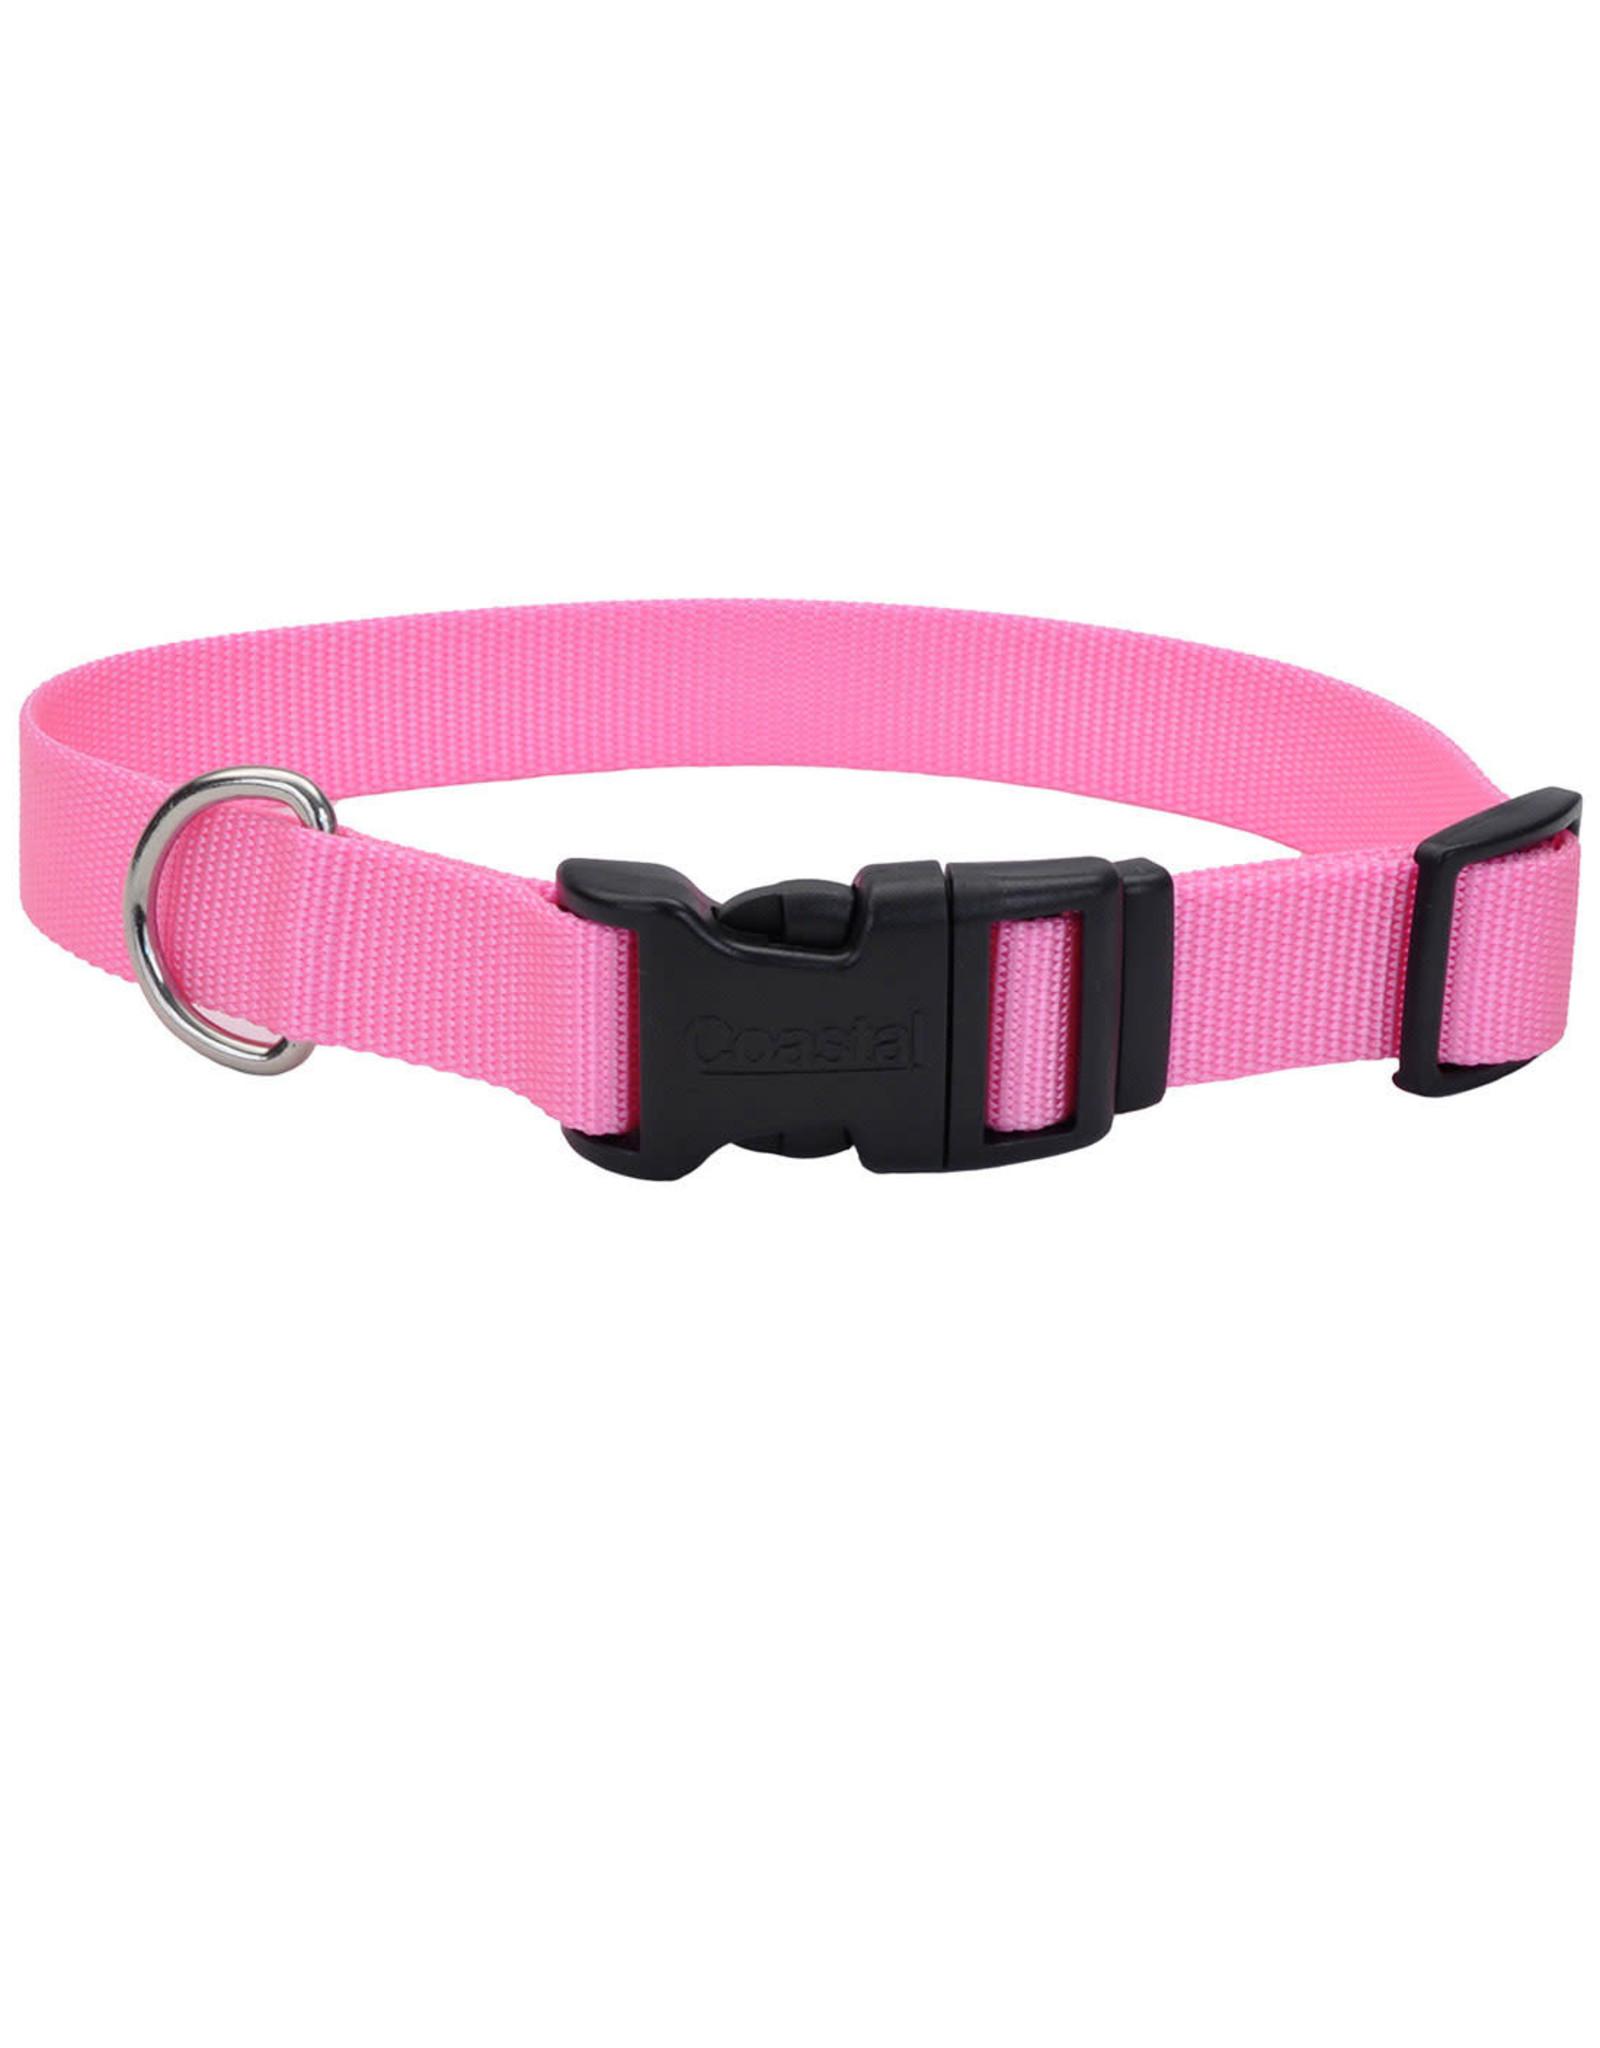 Coastal Pet Products Coastal Pet Adjustable Collar